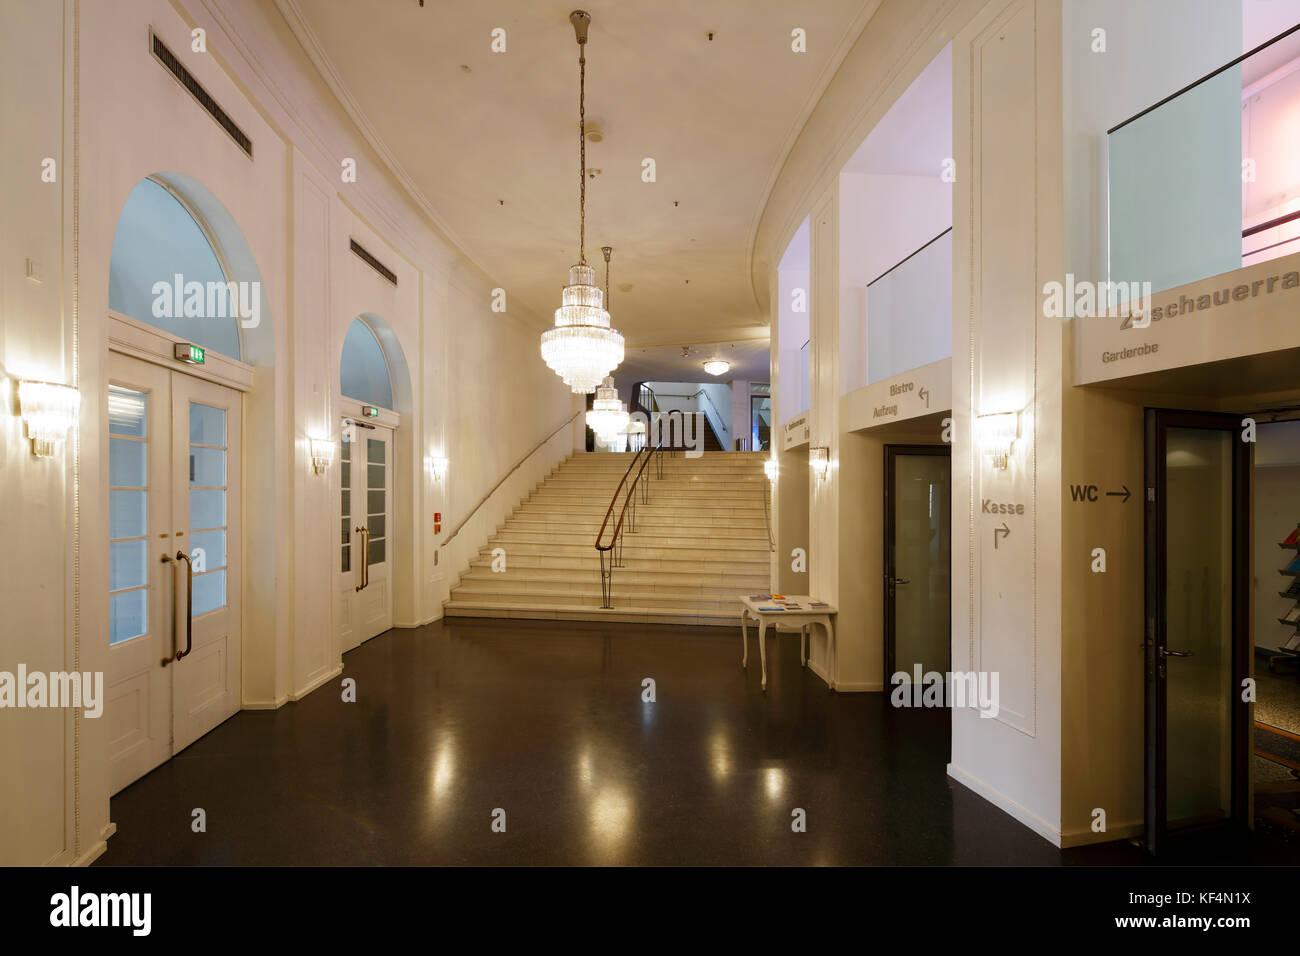 Kronleuchter Treppe ~ Staatstheater mainz rheinland pfalz großes haus vestibuel